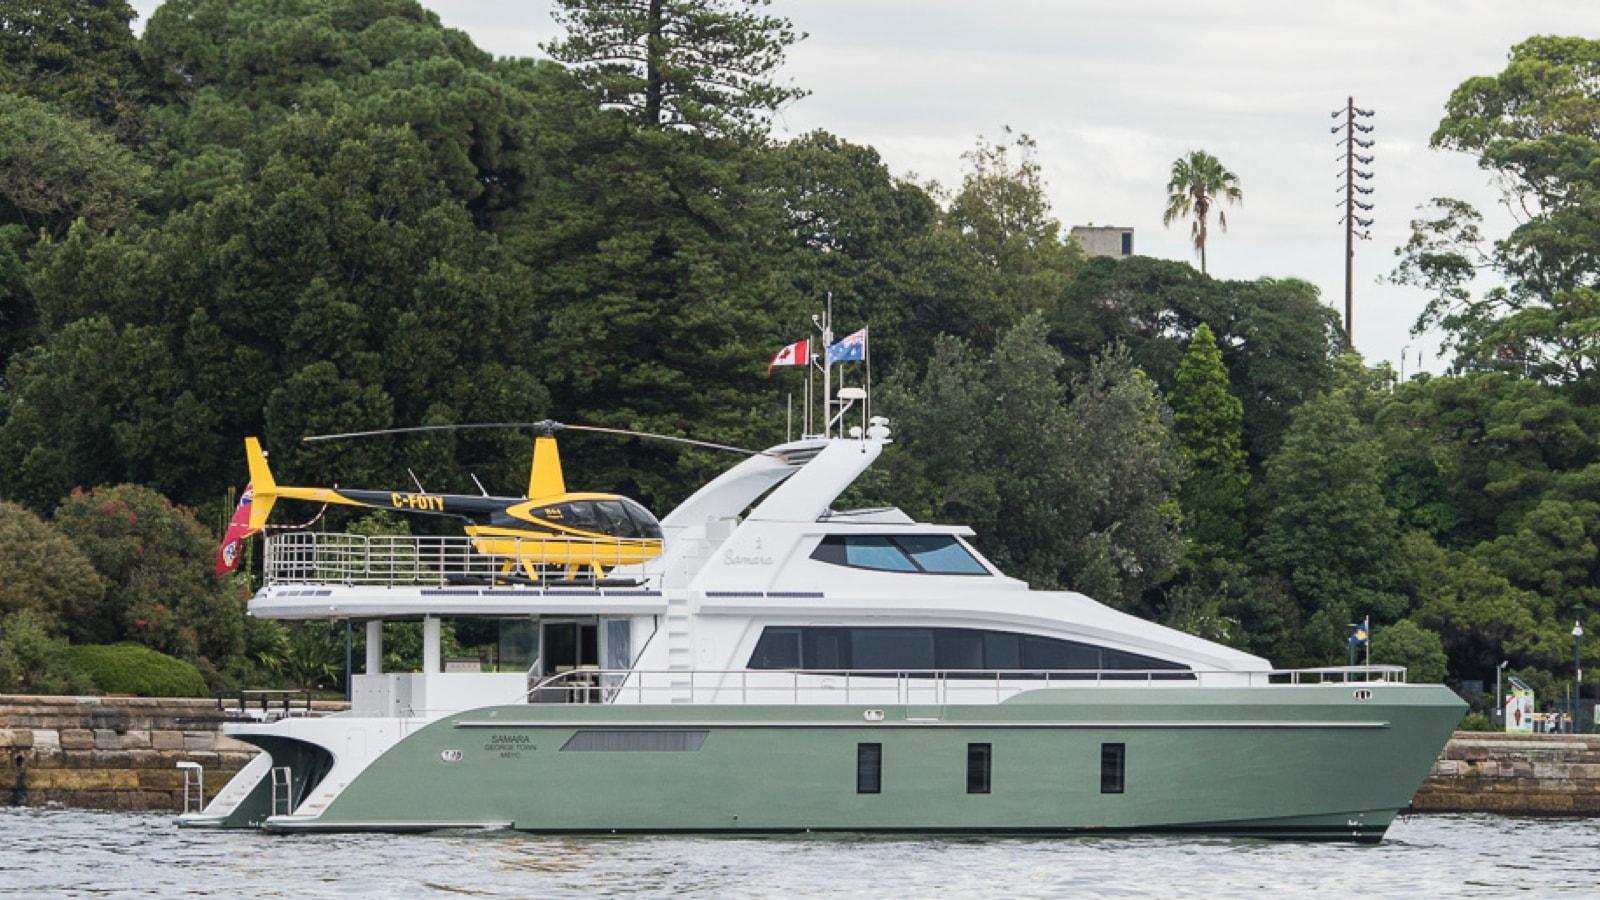 SAMARA Yacht for Sale - IYC